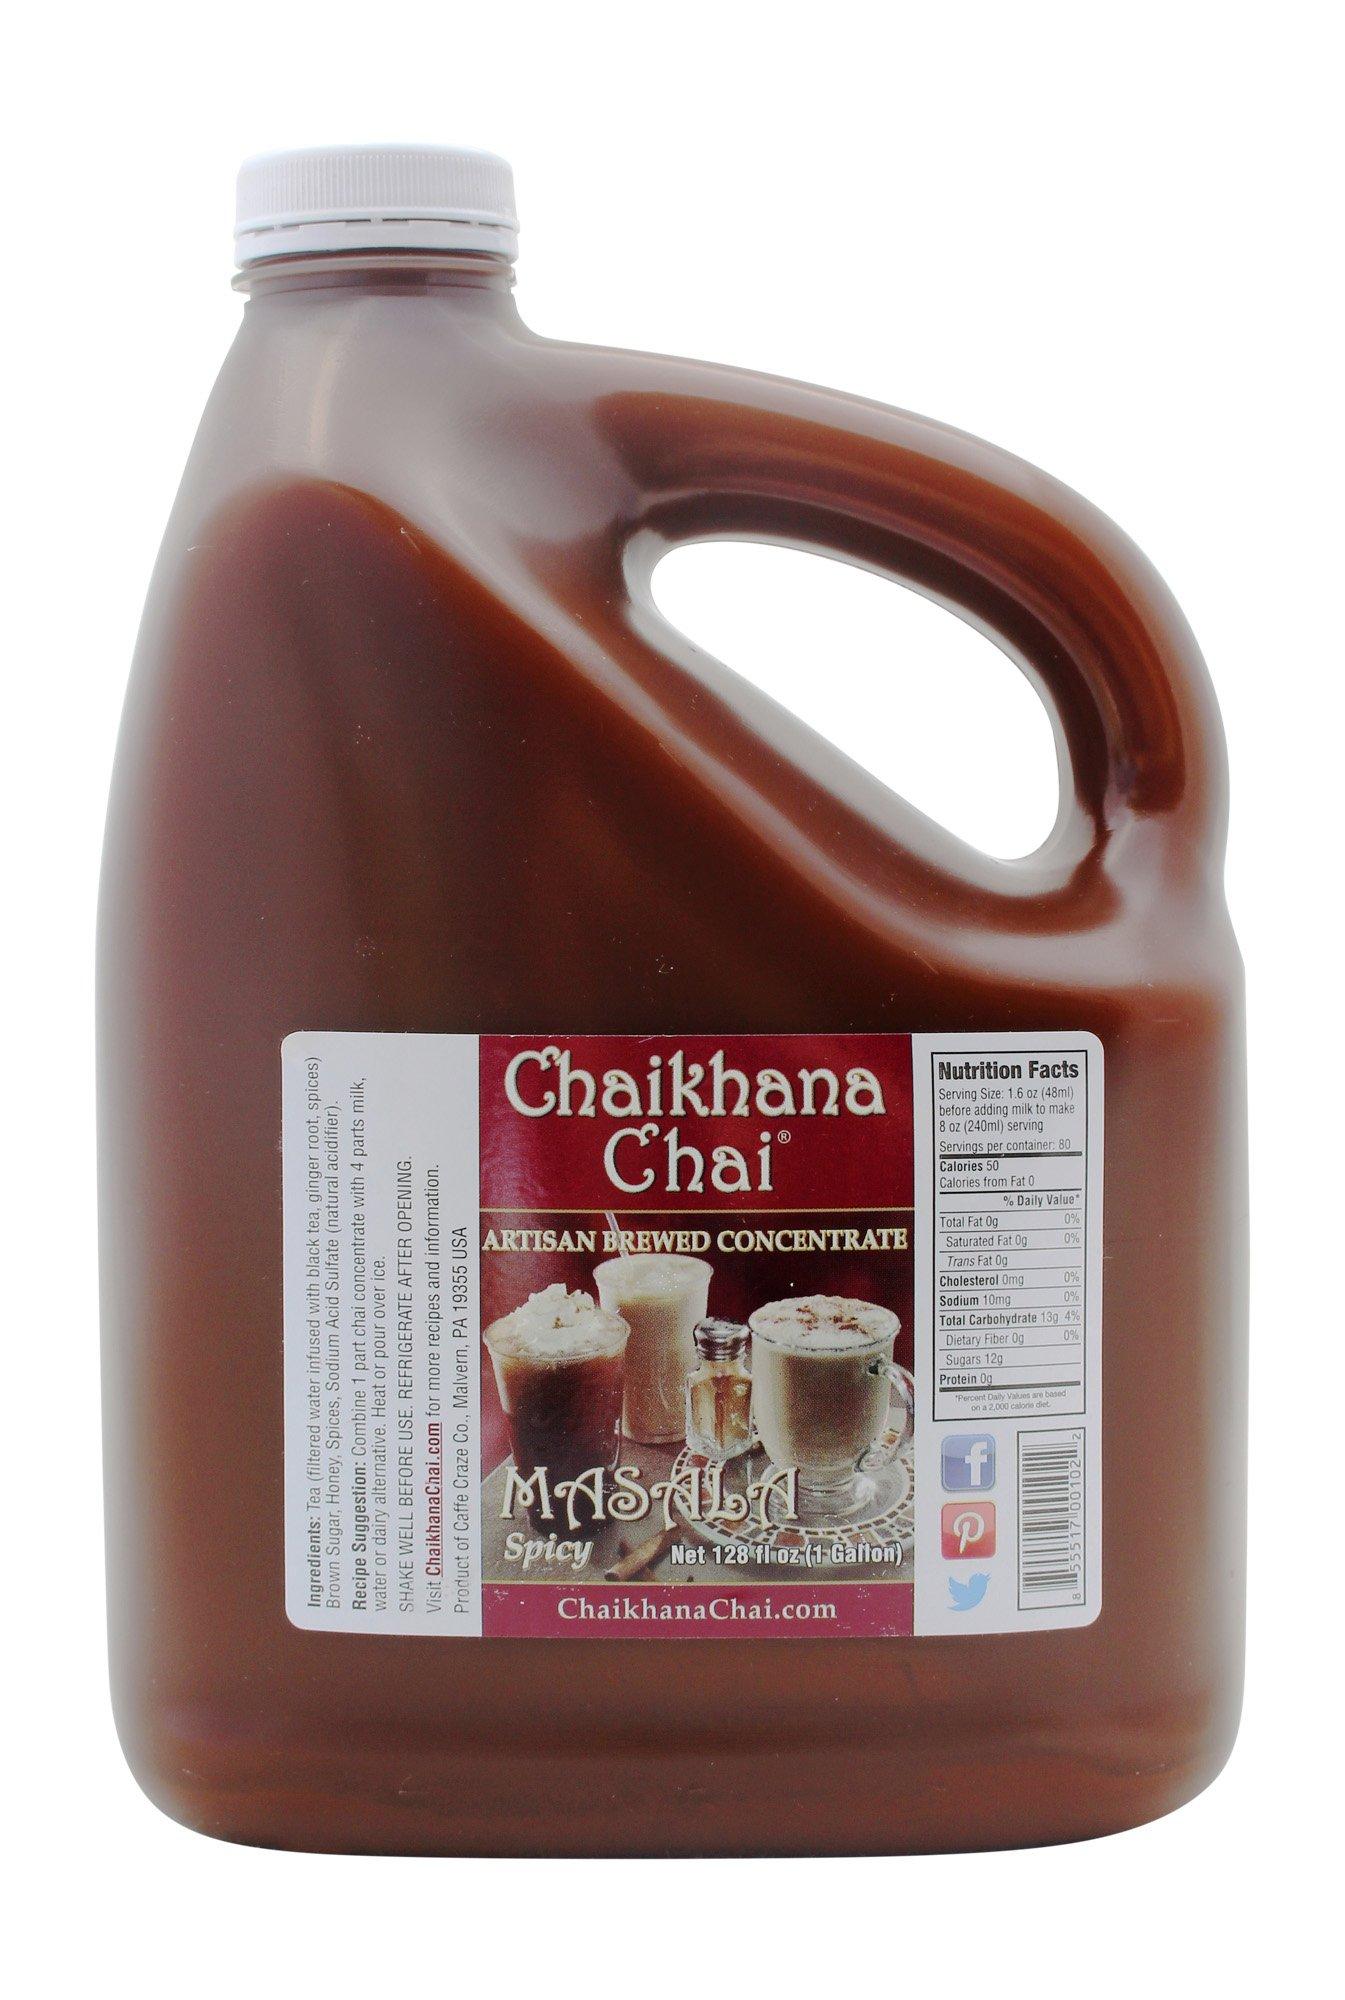 Organic Black Tea, Spicy Masala Chai Concentrate - 1 Gallon Jug - Makes 80 servings by Chaikhana Chai